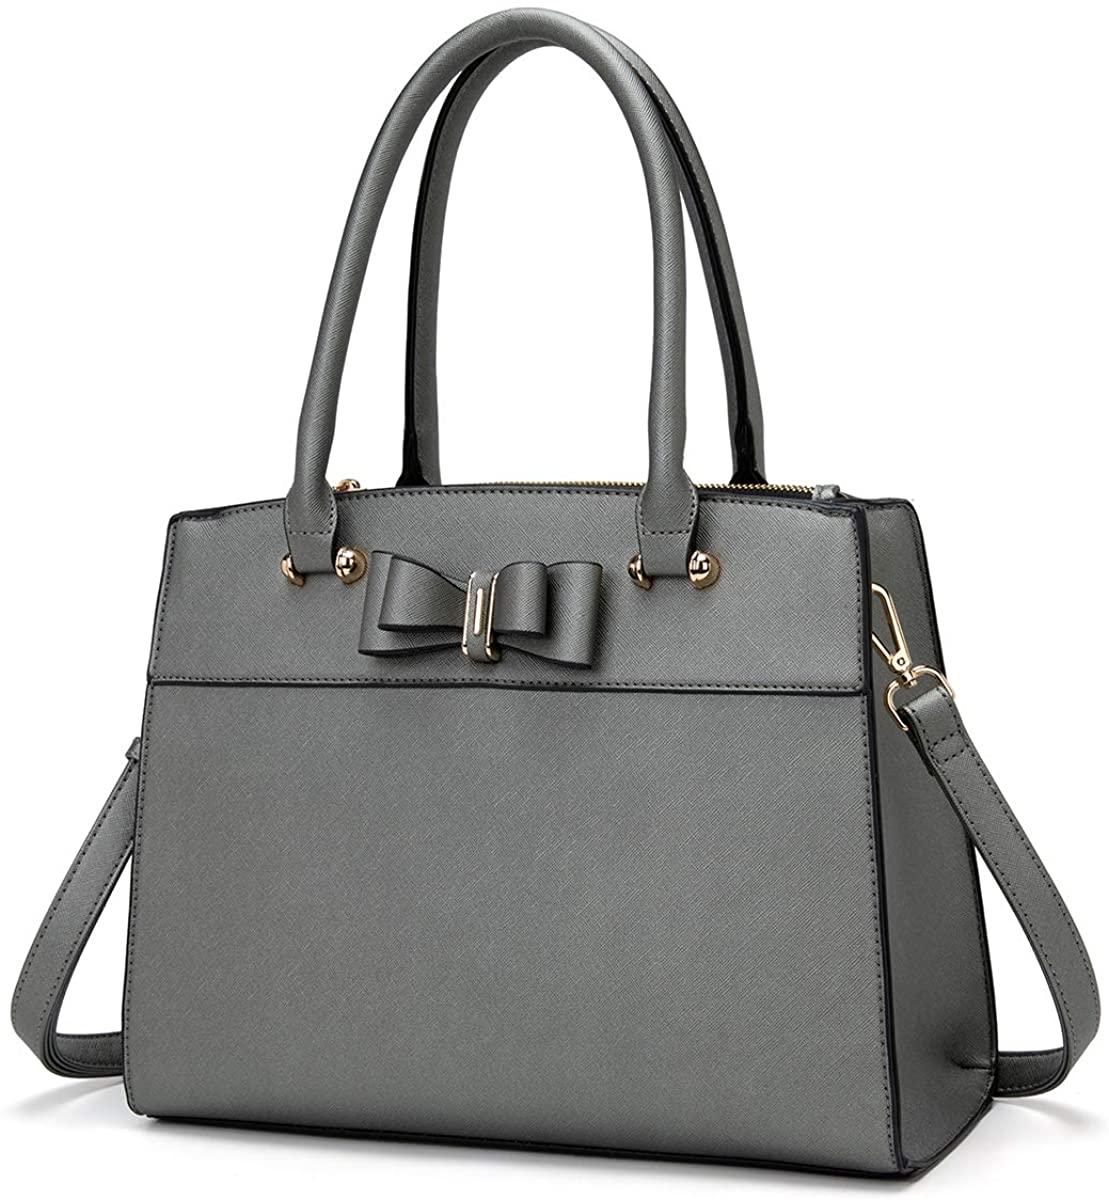 LJOSEIND Women's Handbags Bowknot Purses Designer Satchel Totes Fashion Shoulder Bags